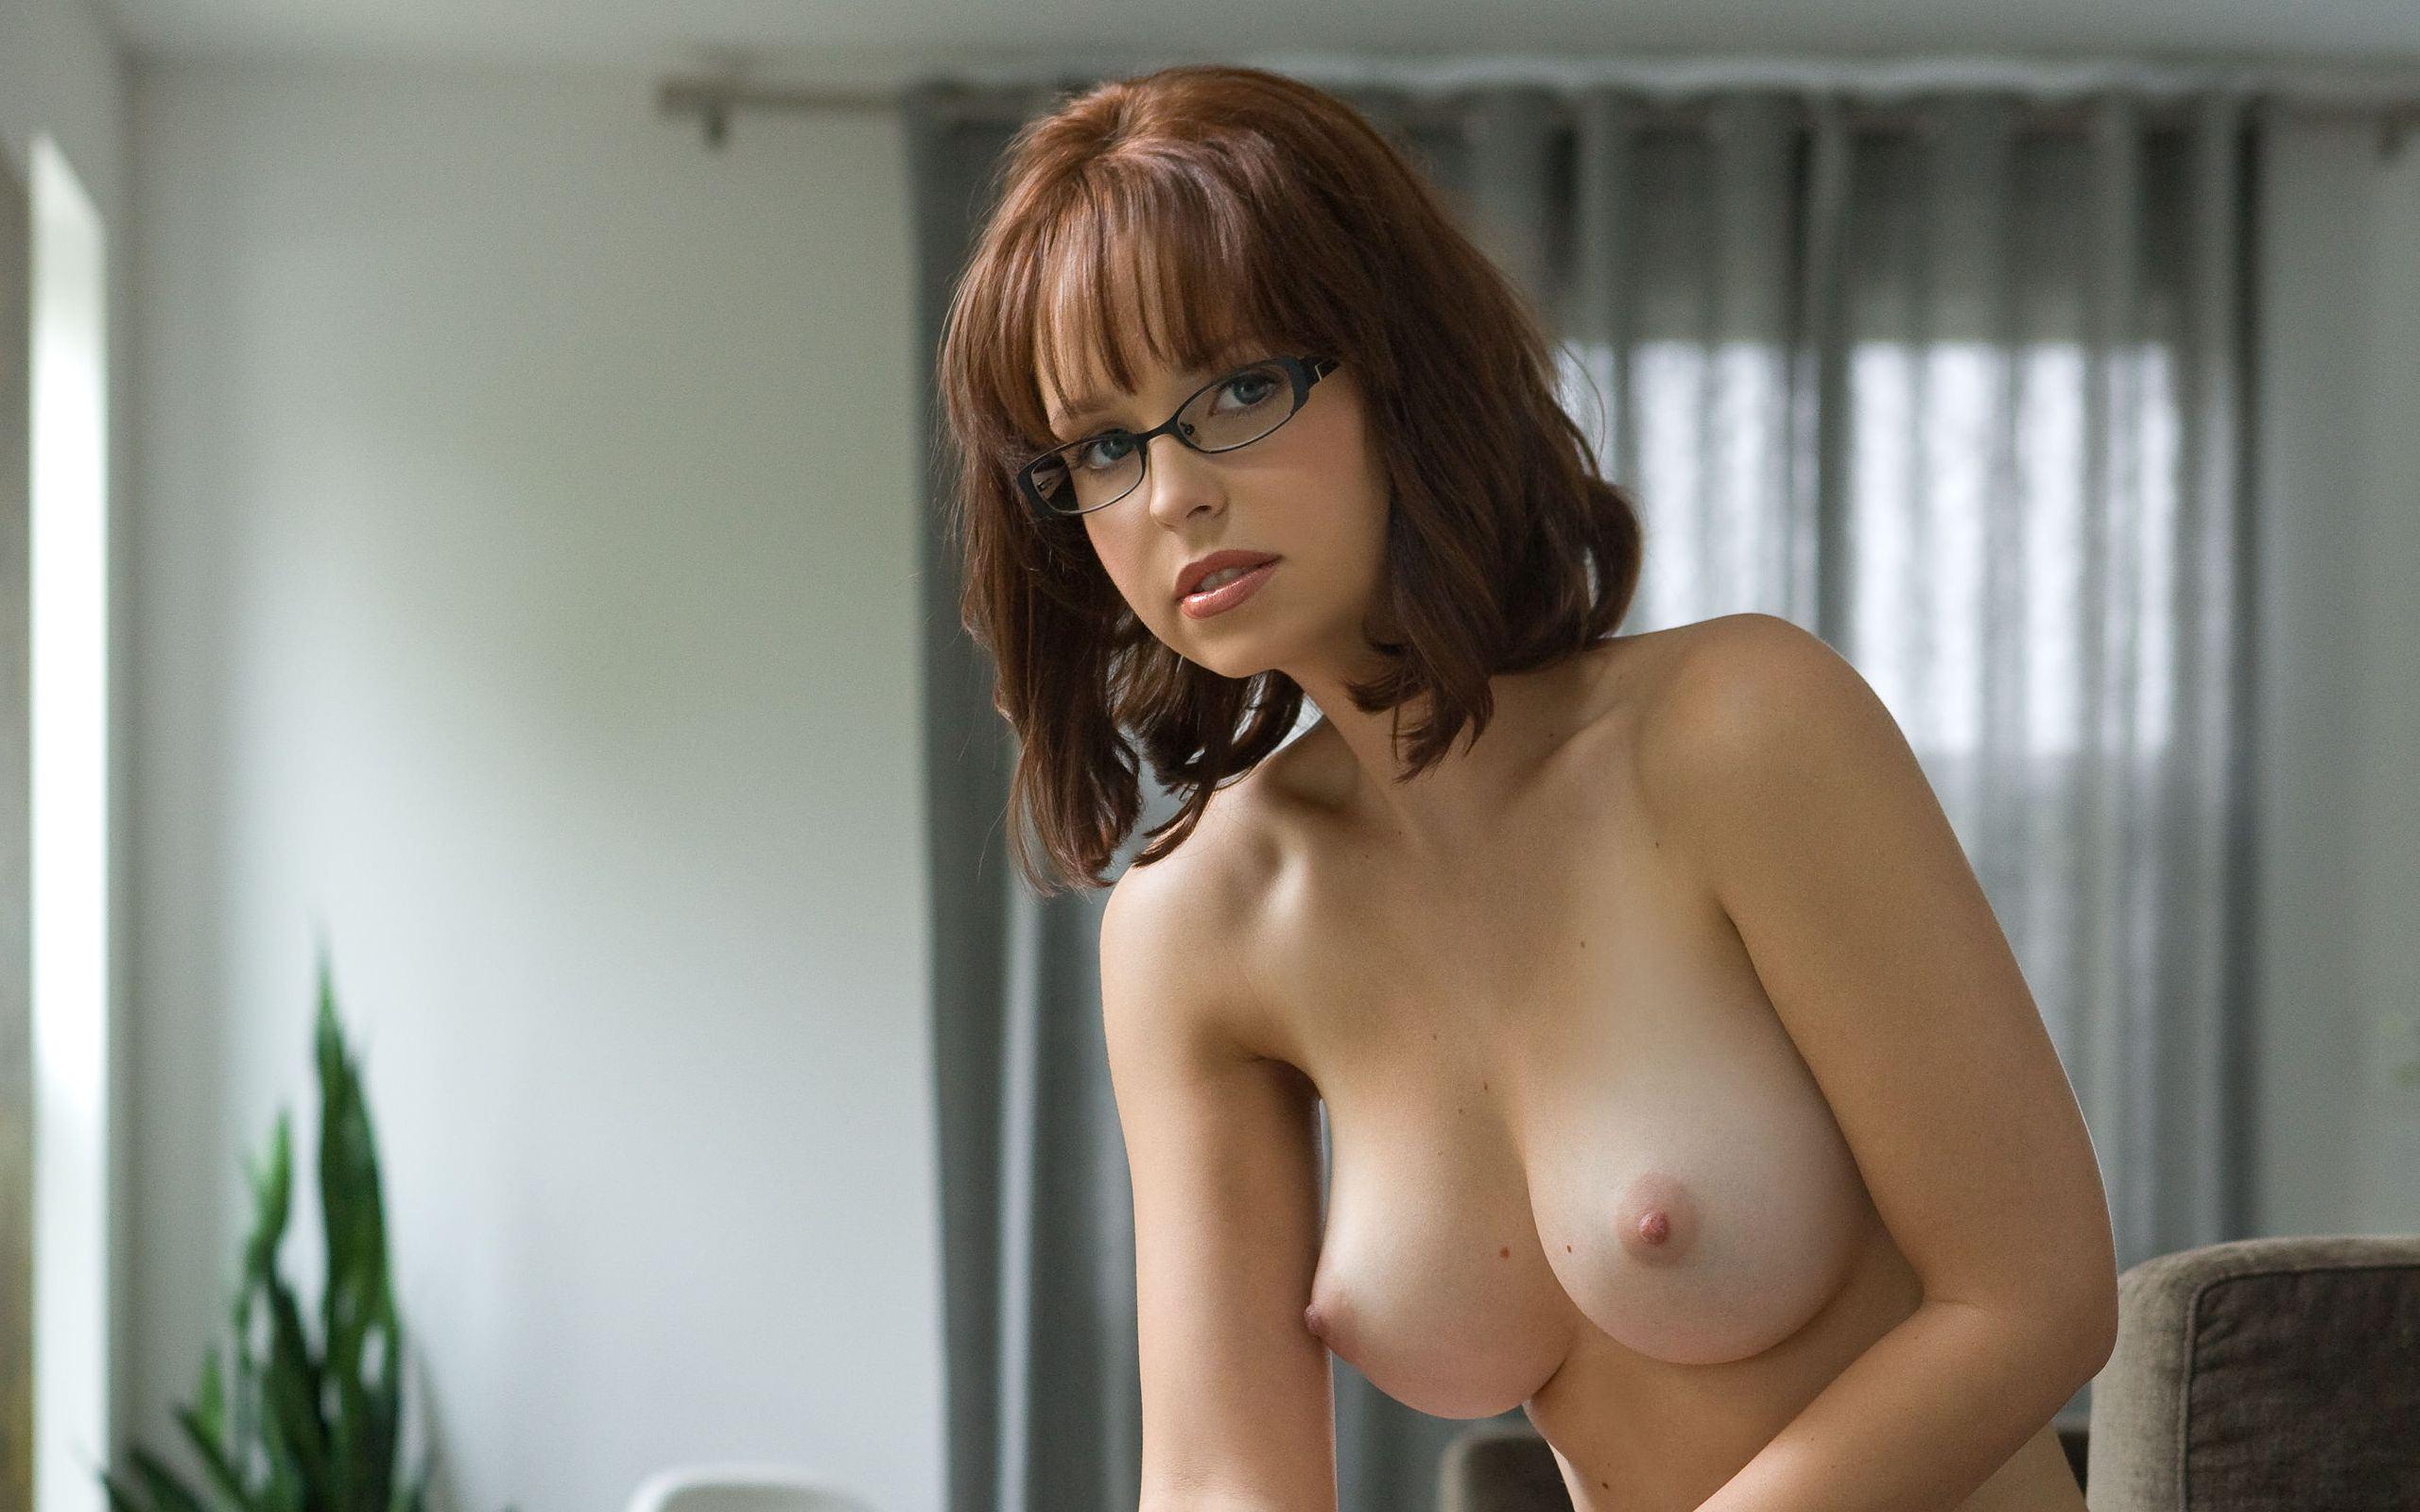 Nakat natalya rudakova sexy boobs pics